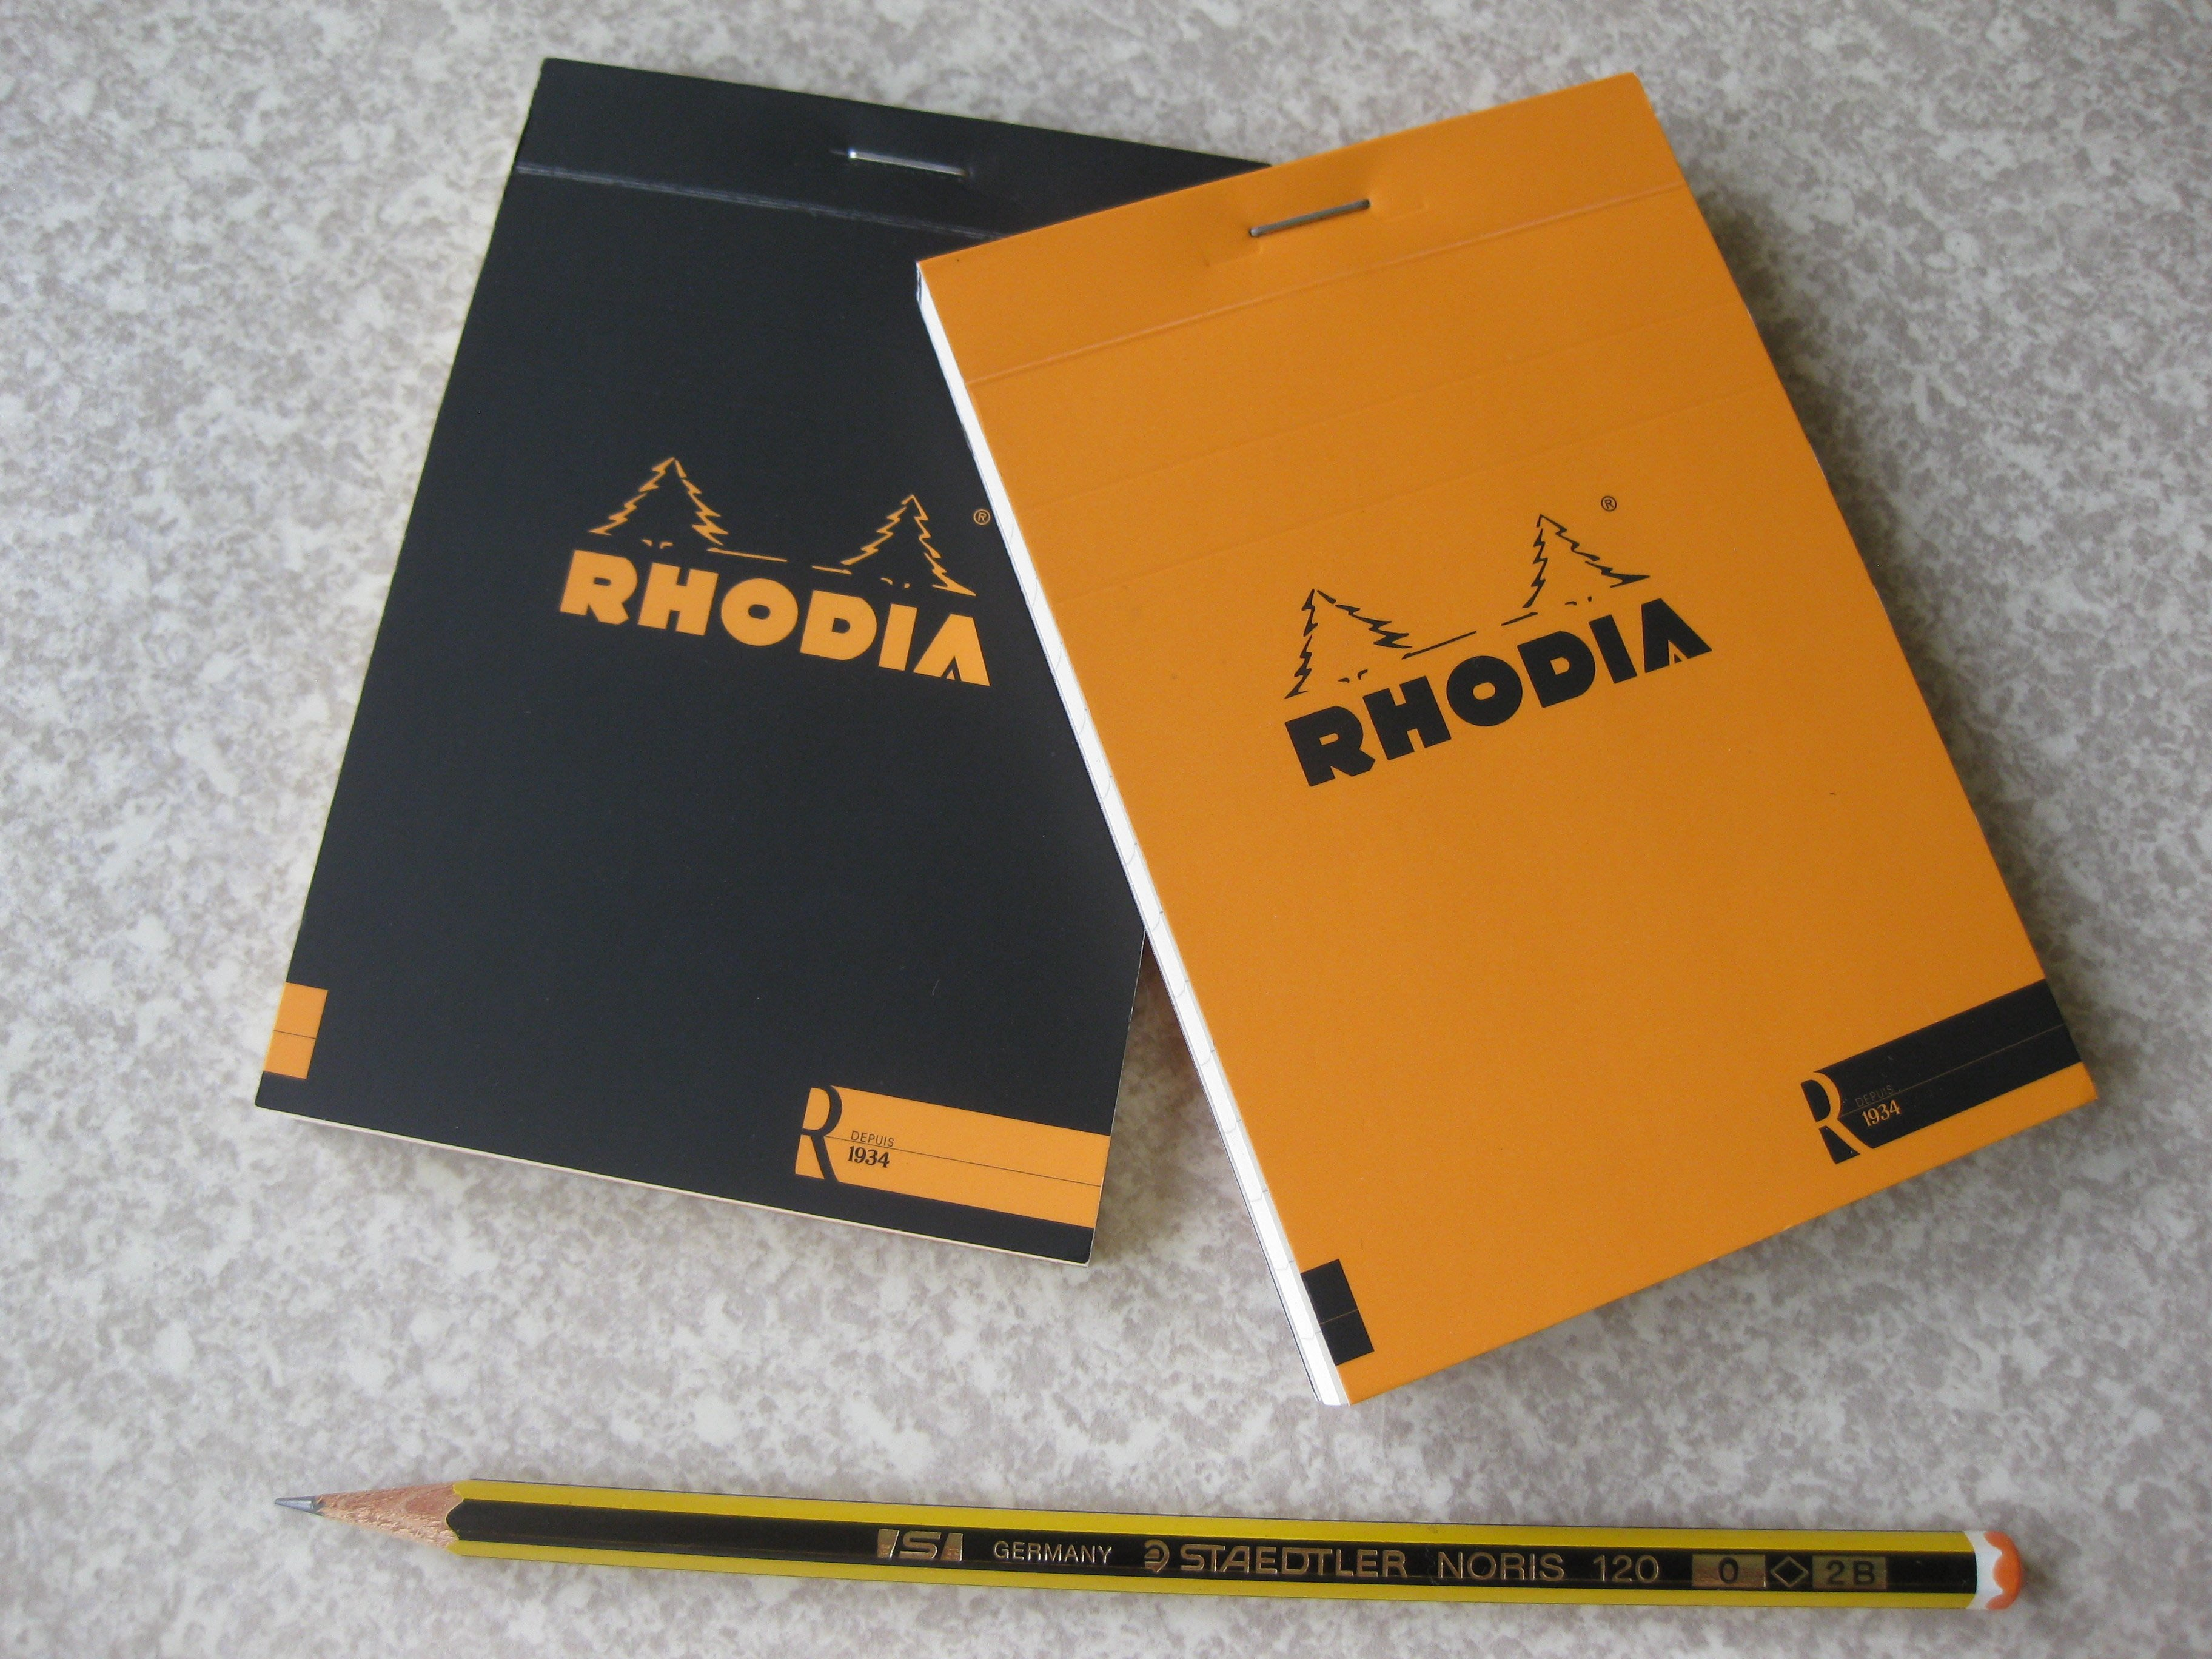 Rhodia 經典款 Le R 1934筆記本 2本合售 (8.5x12cm)(空白頁/ 黑)& 橫格頁/ 橘)